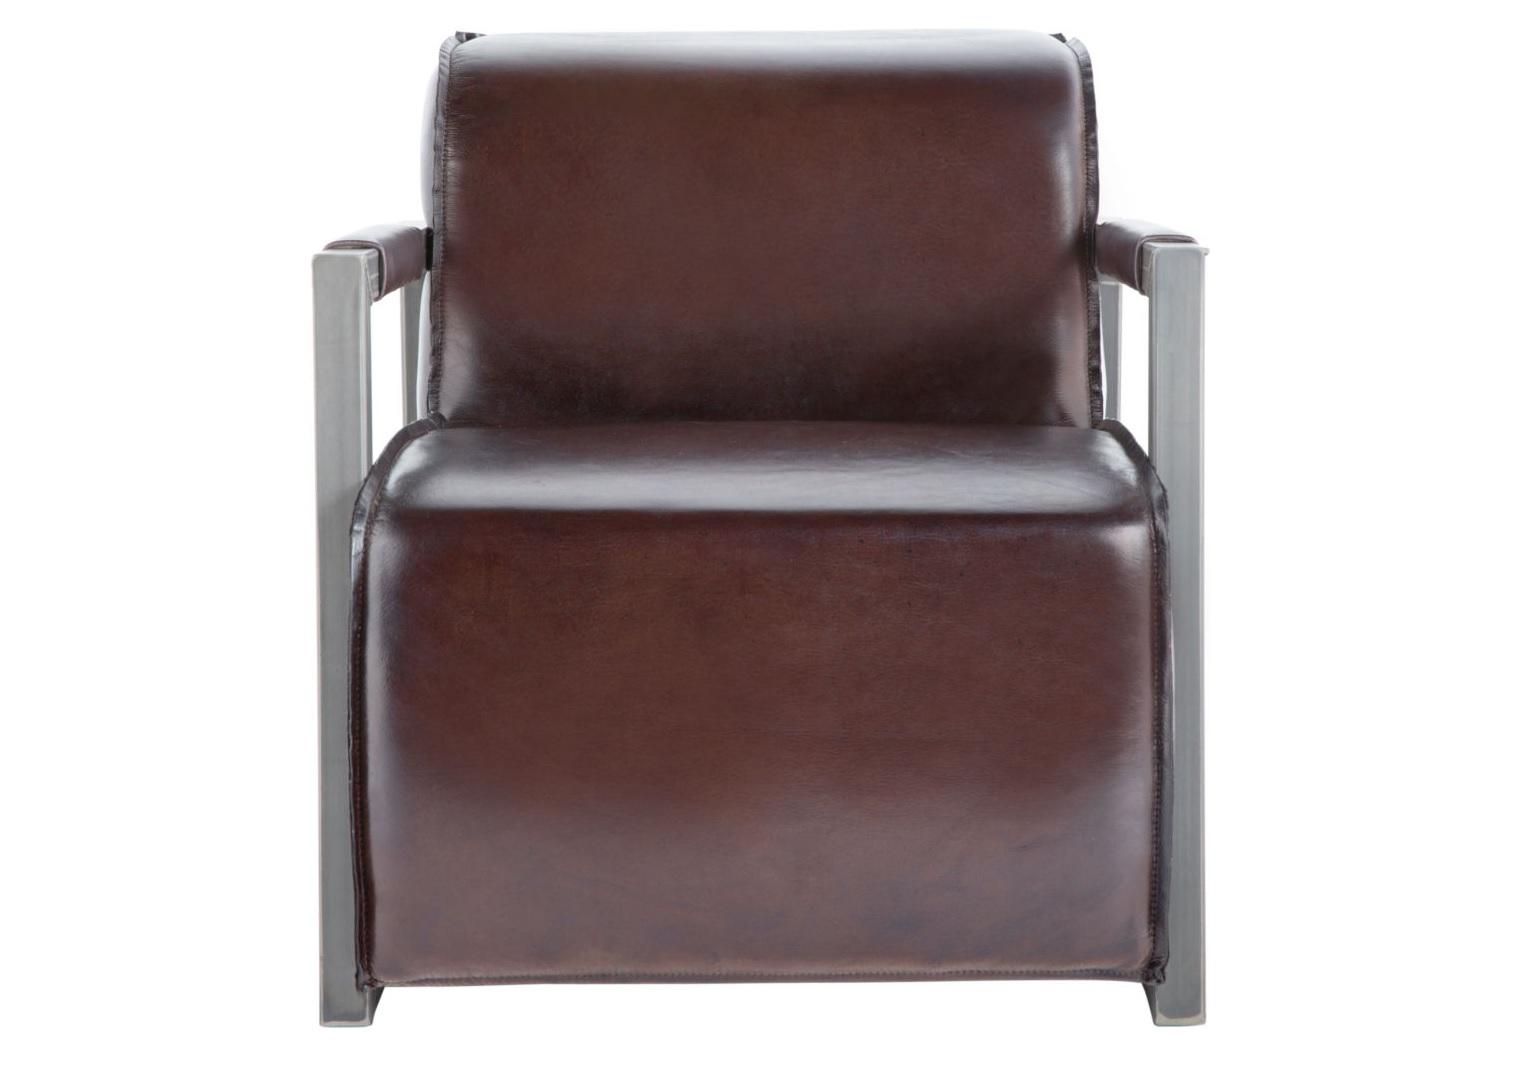 Кресло Mica Rich BrownКожаные кресла<br><br><br>Material: Кожа<br>Width см: 81<br>Depth см: 72<br>Height см: 73